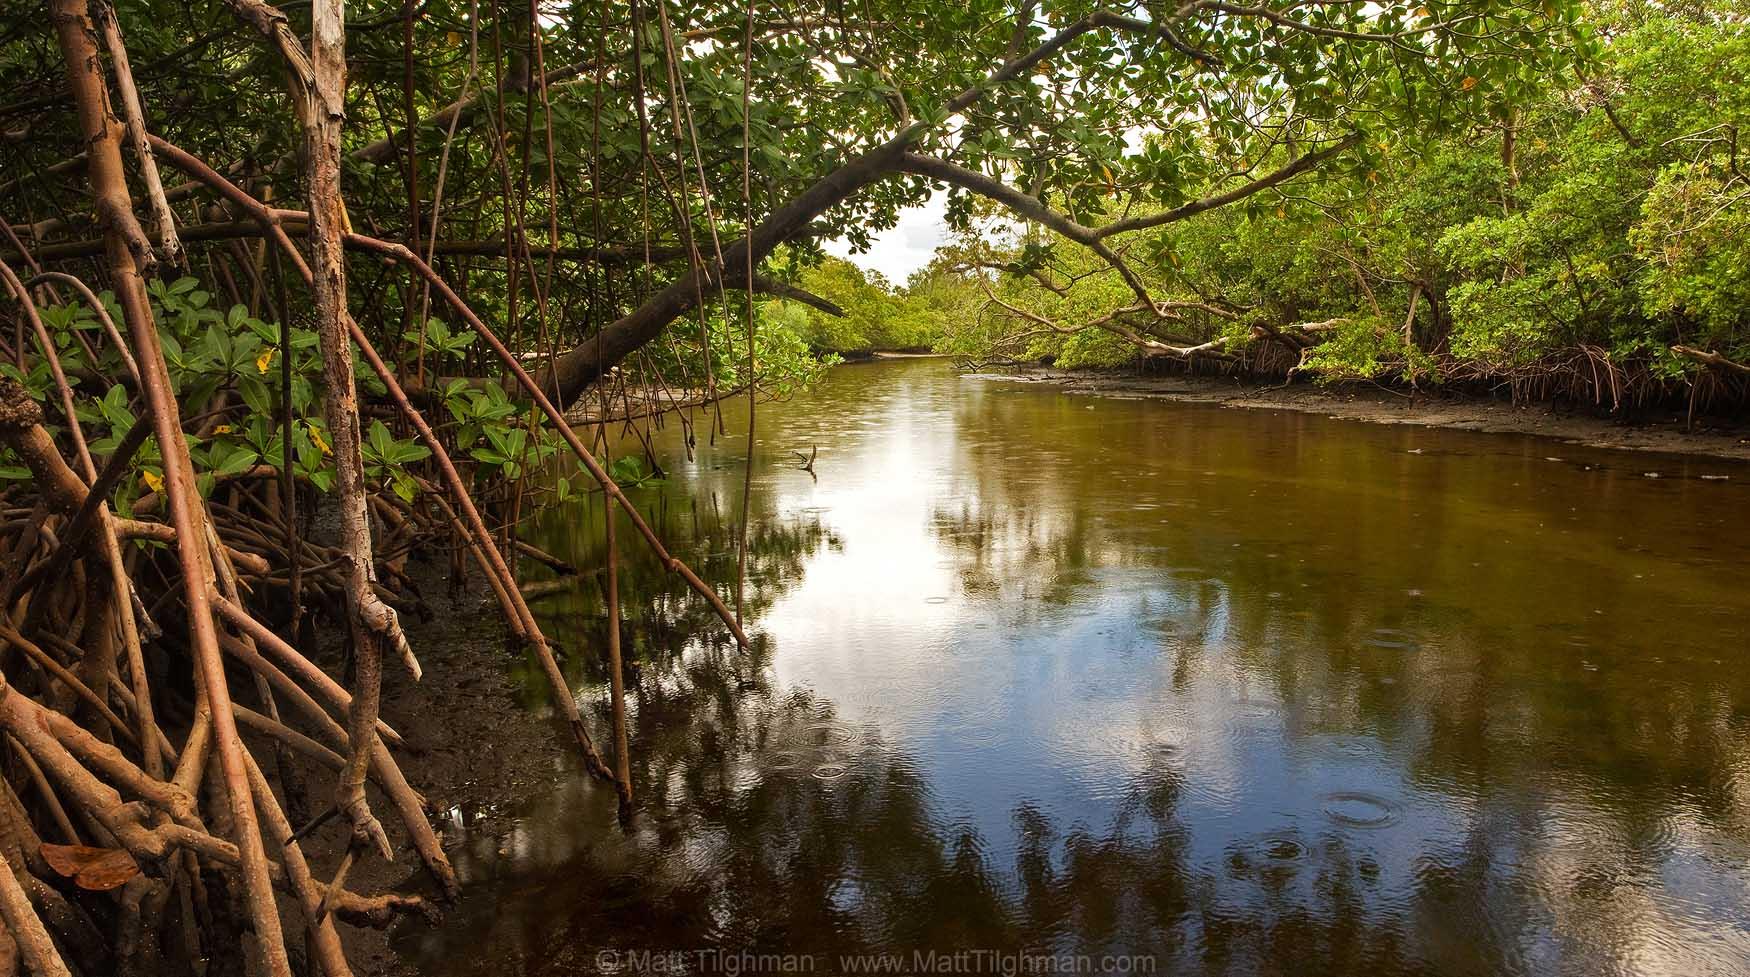 Last Shot Before the Rain - Whiskey Creek, Florida